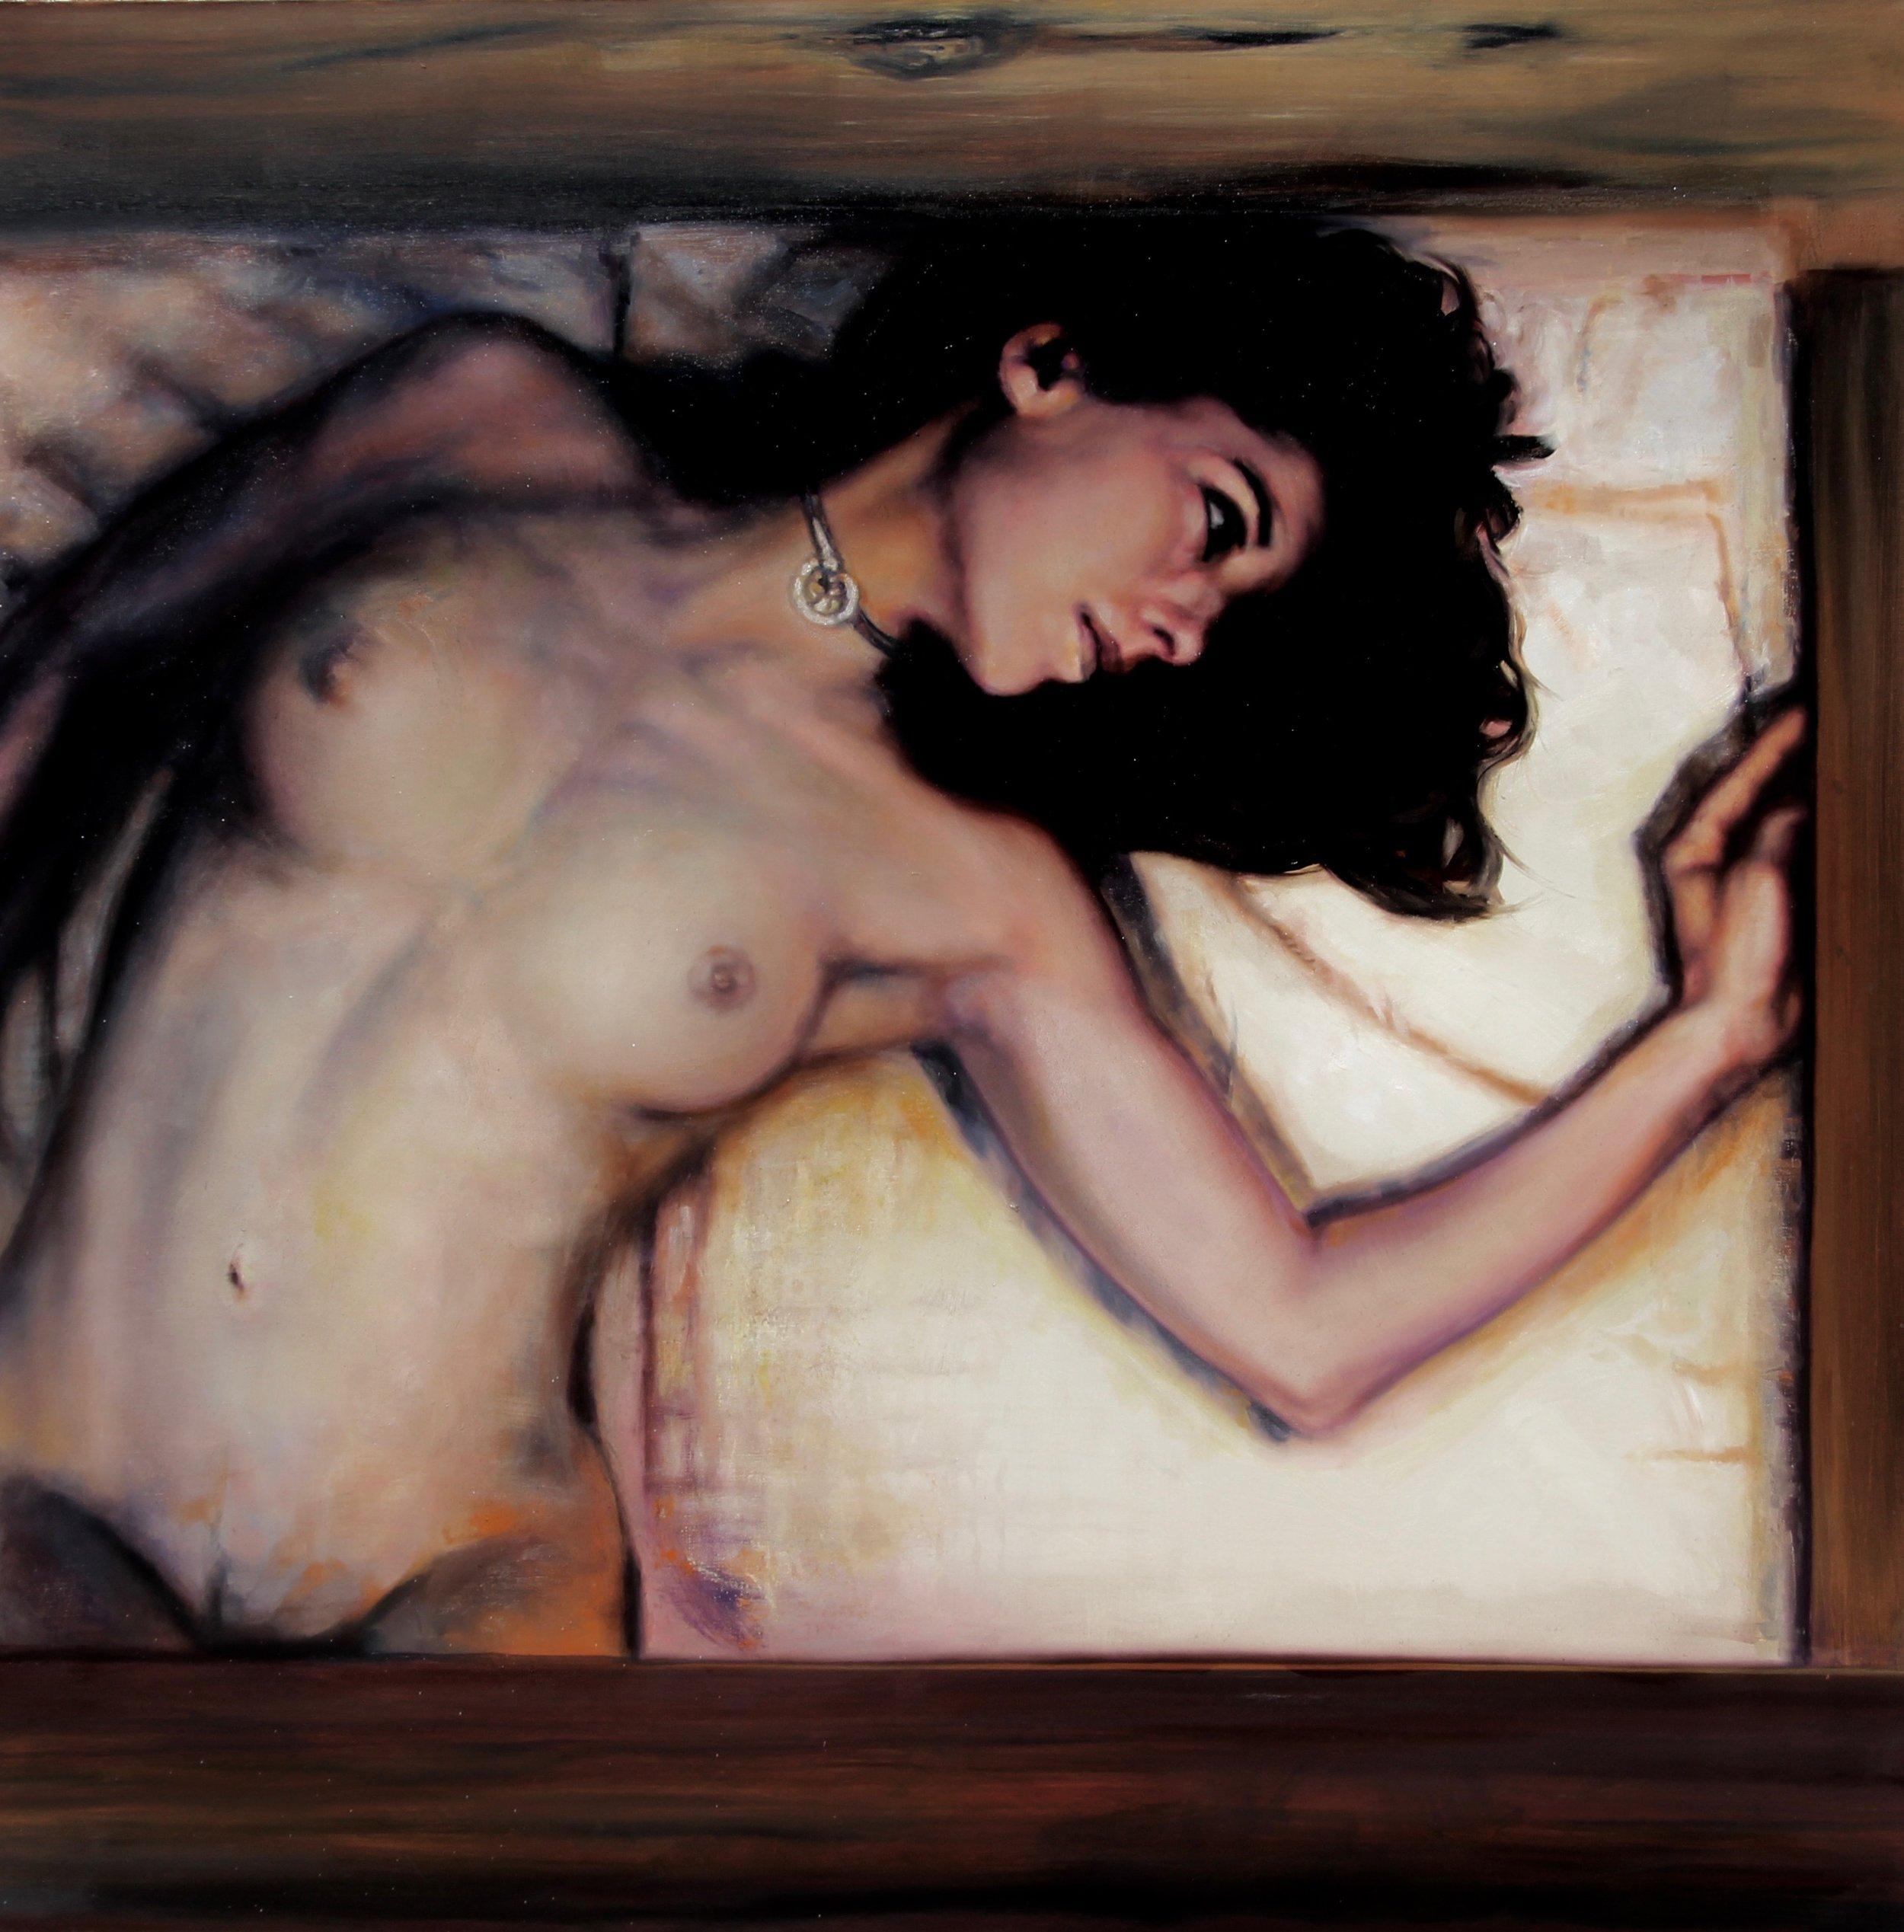 Woman In A Box - Debbie 1 4' x 4'